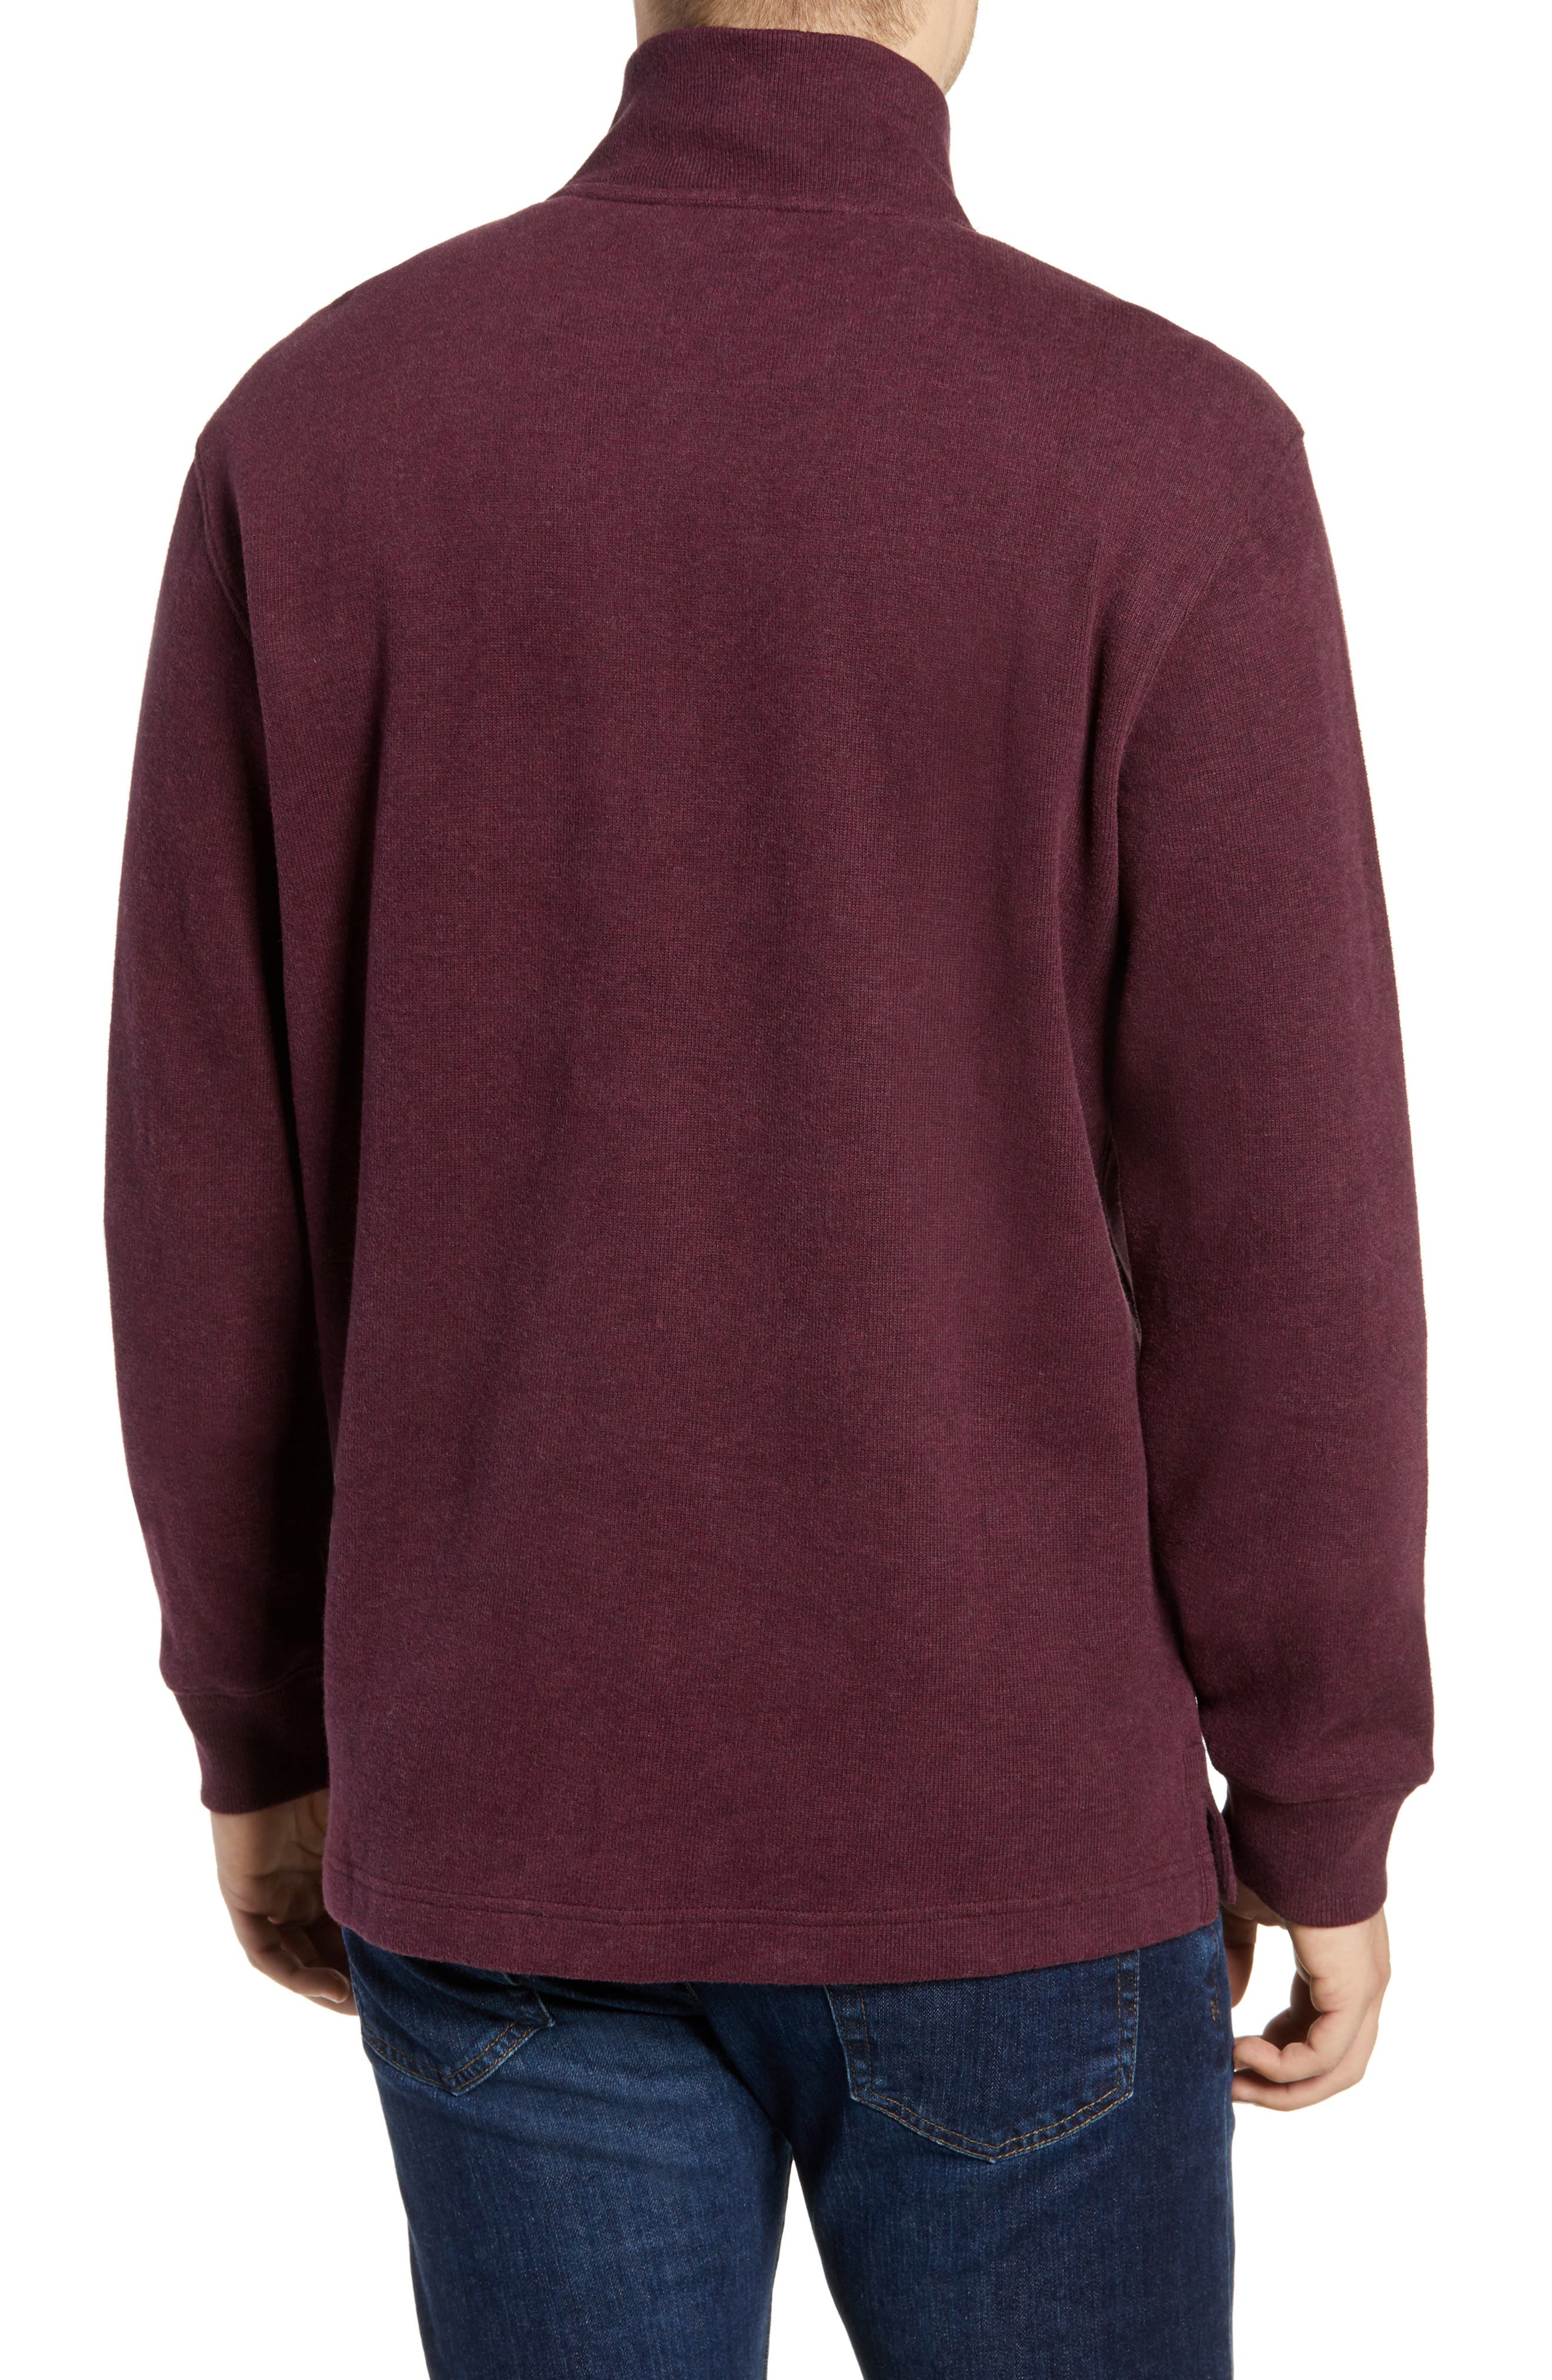 RODD & GUNN, Alton Ave Regular Fit Pullover Sweatshirt, Alternate thumbnail 2, color, BURGUNDY